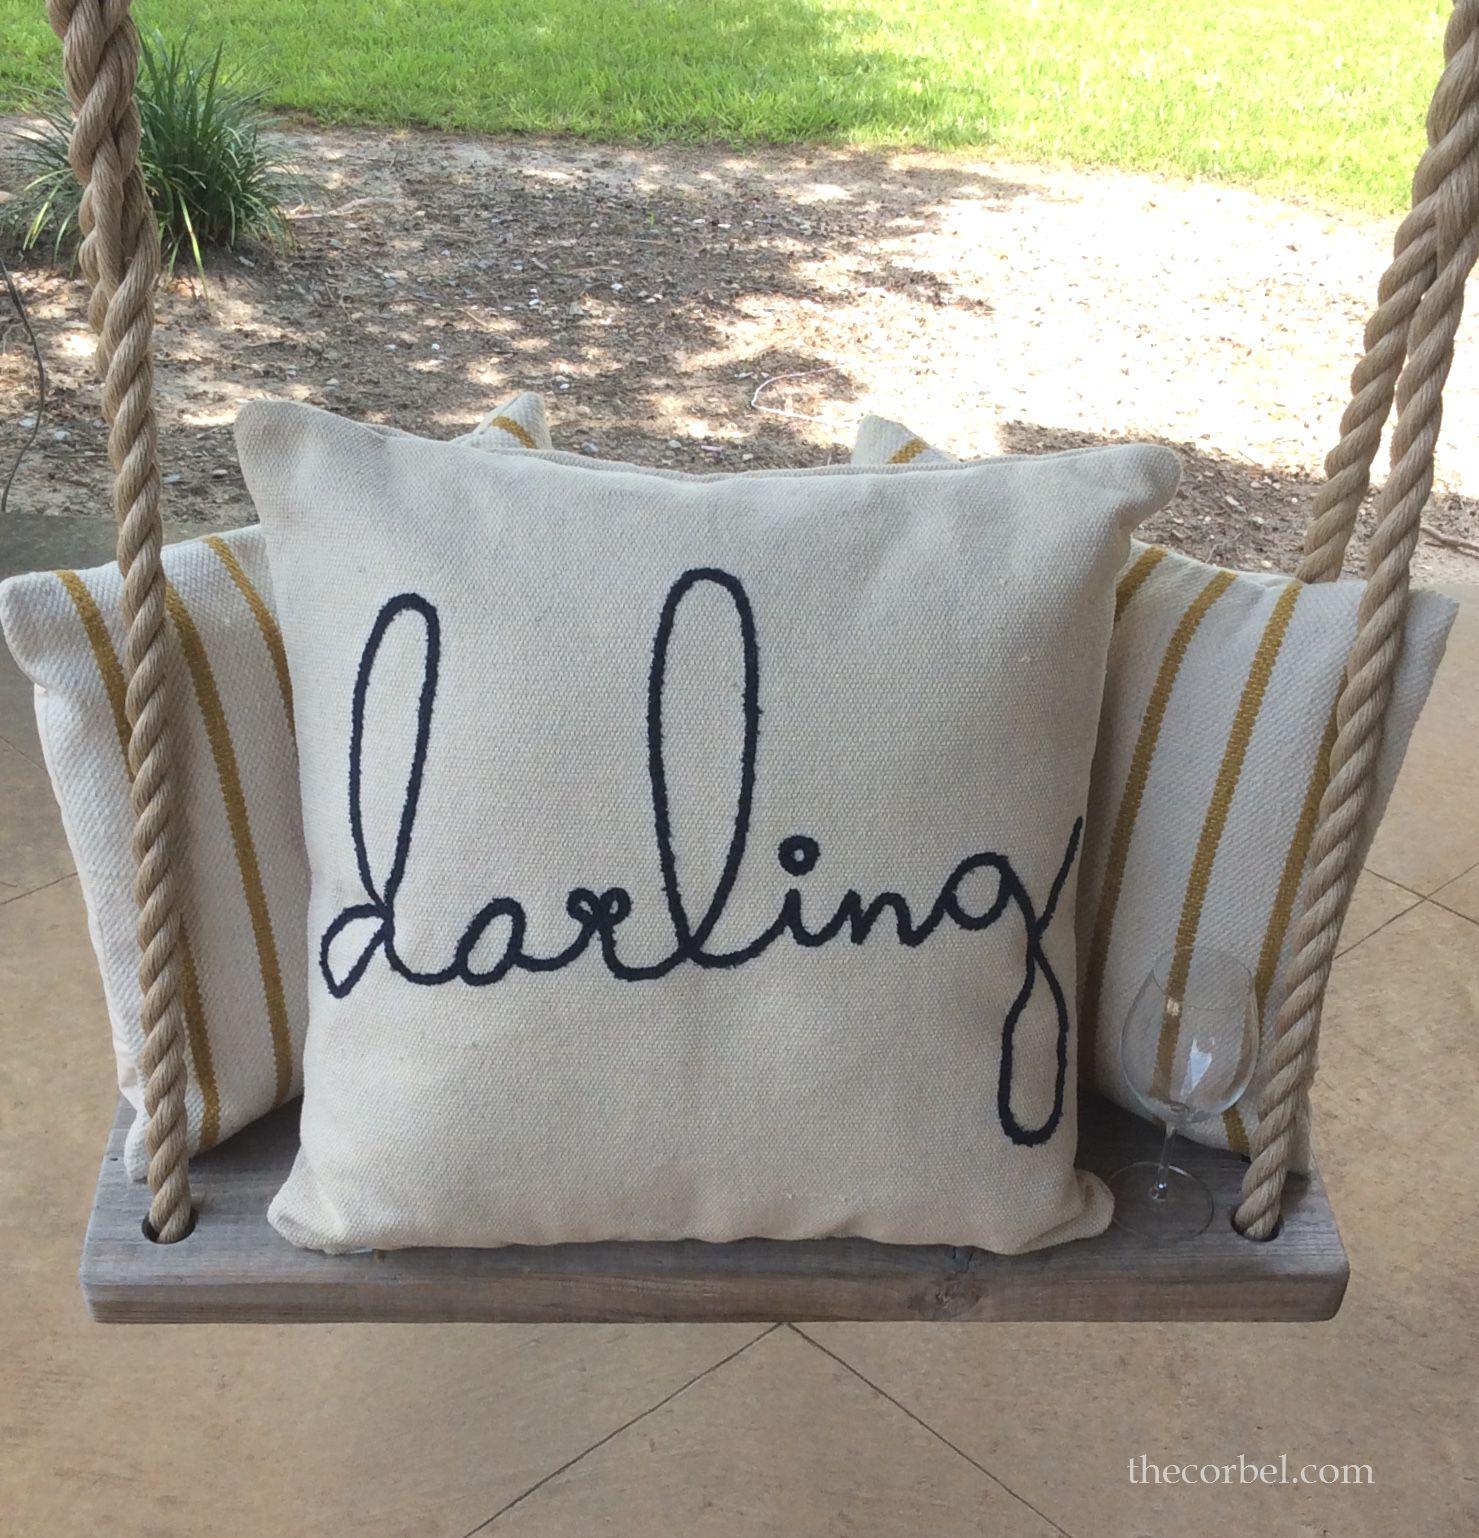 darling pillow 2 the corbel.jpg